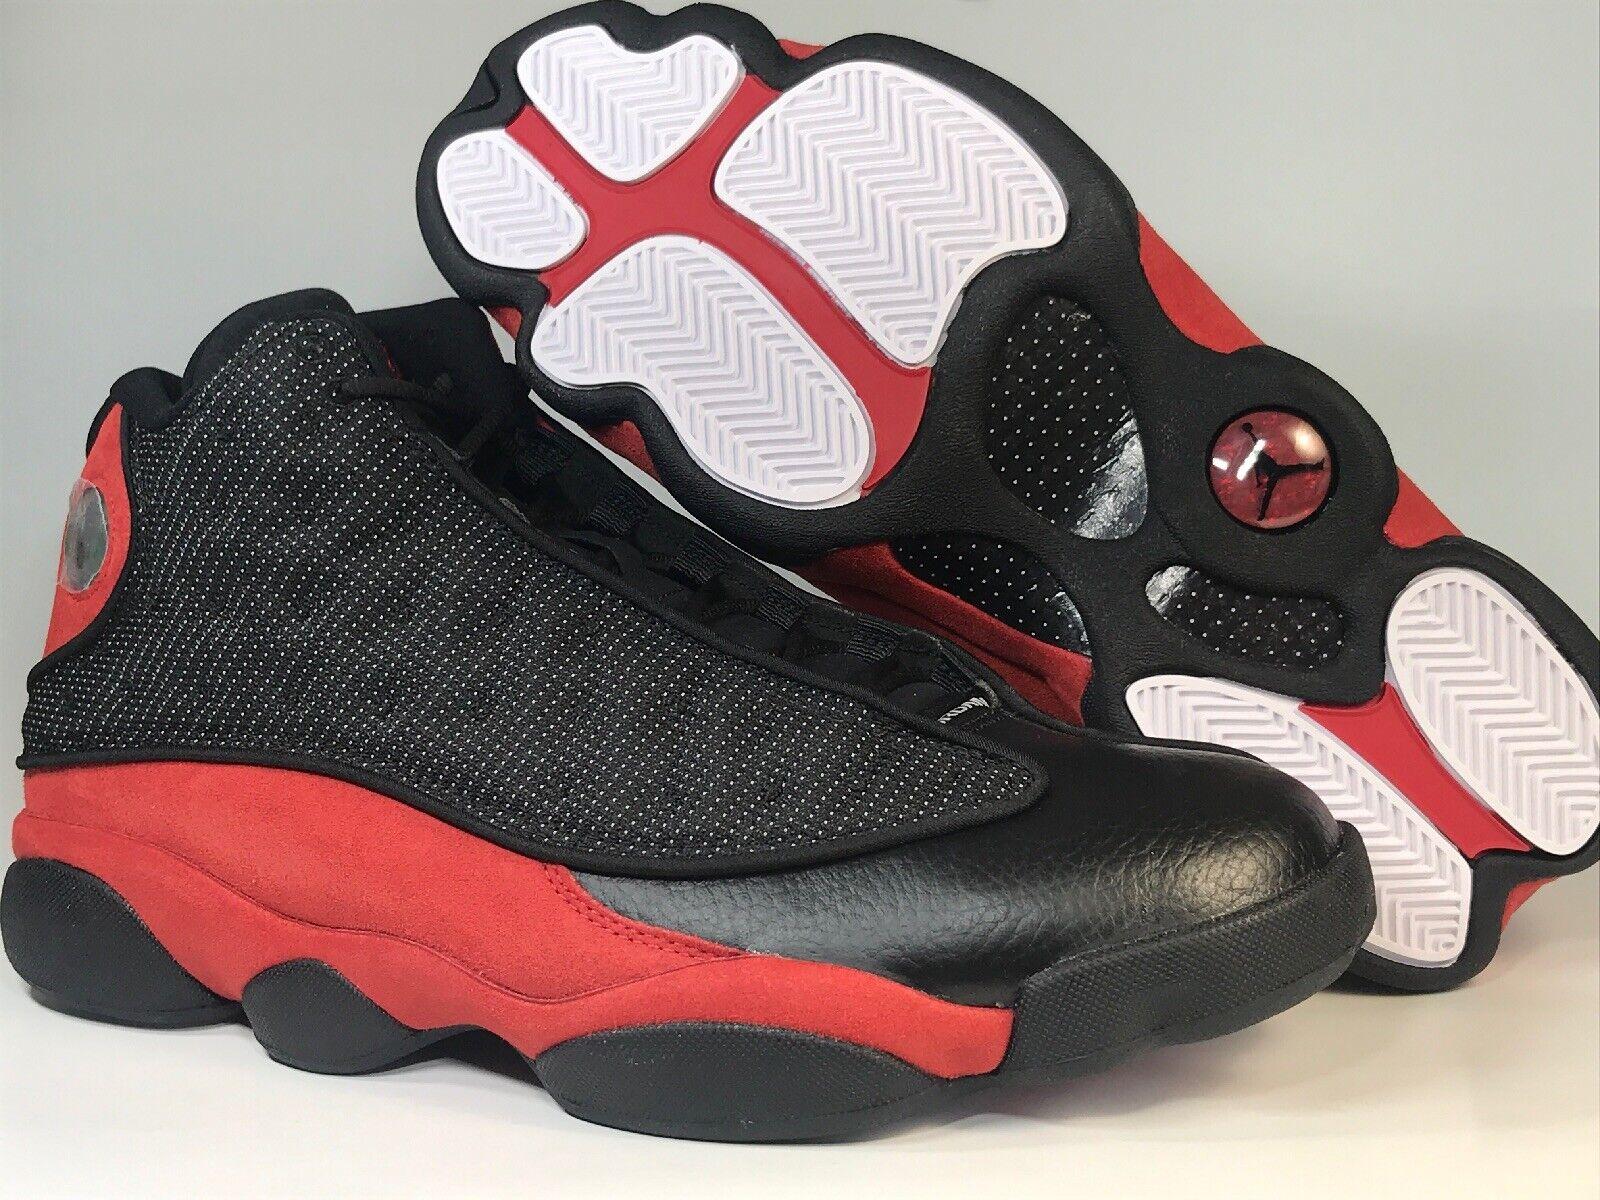 Nike Air Jordan Jordan Jordan 13 XIII Bred black red Size 11 retro og 2017 efafaa